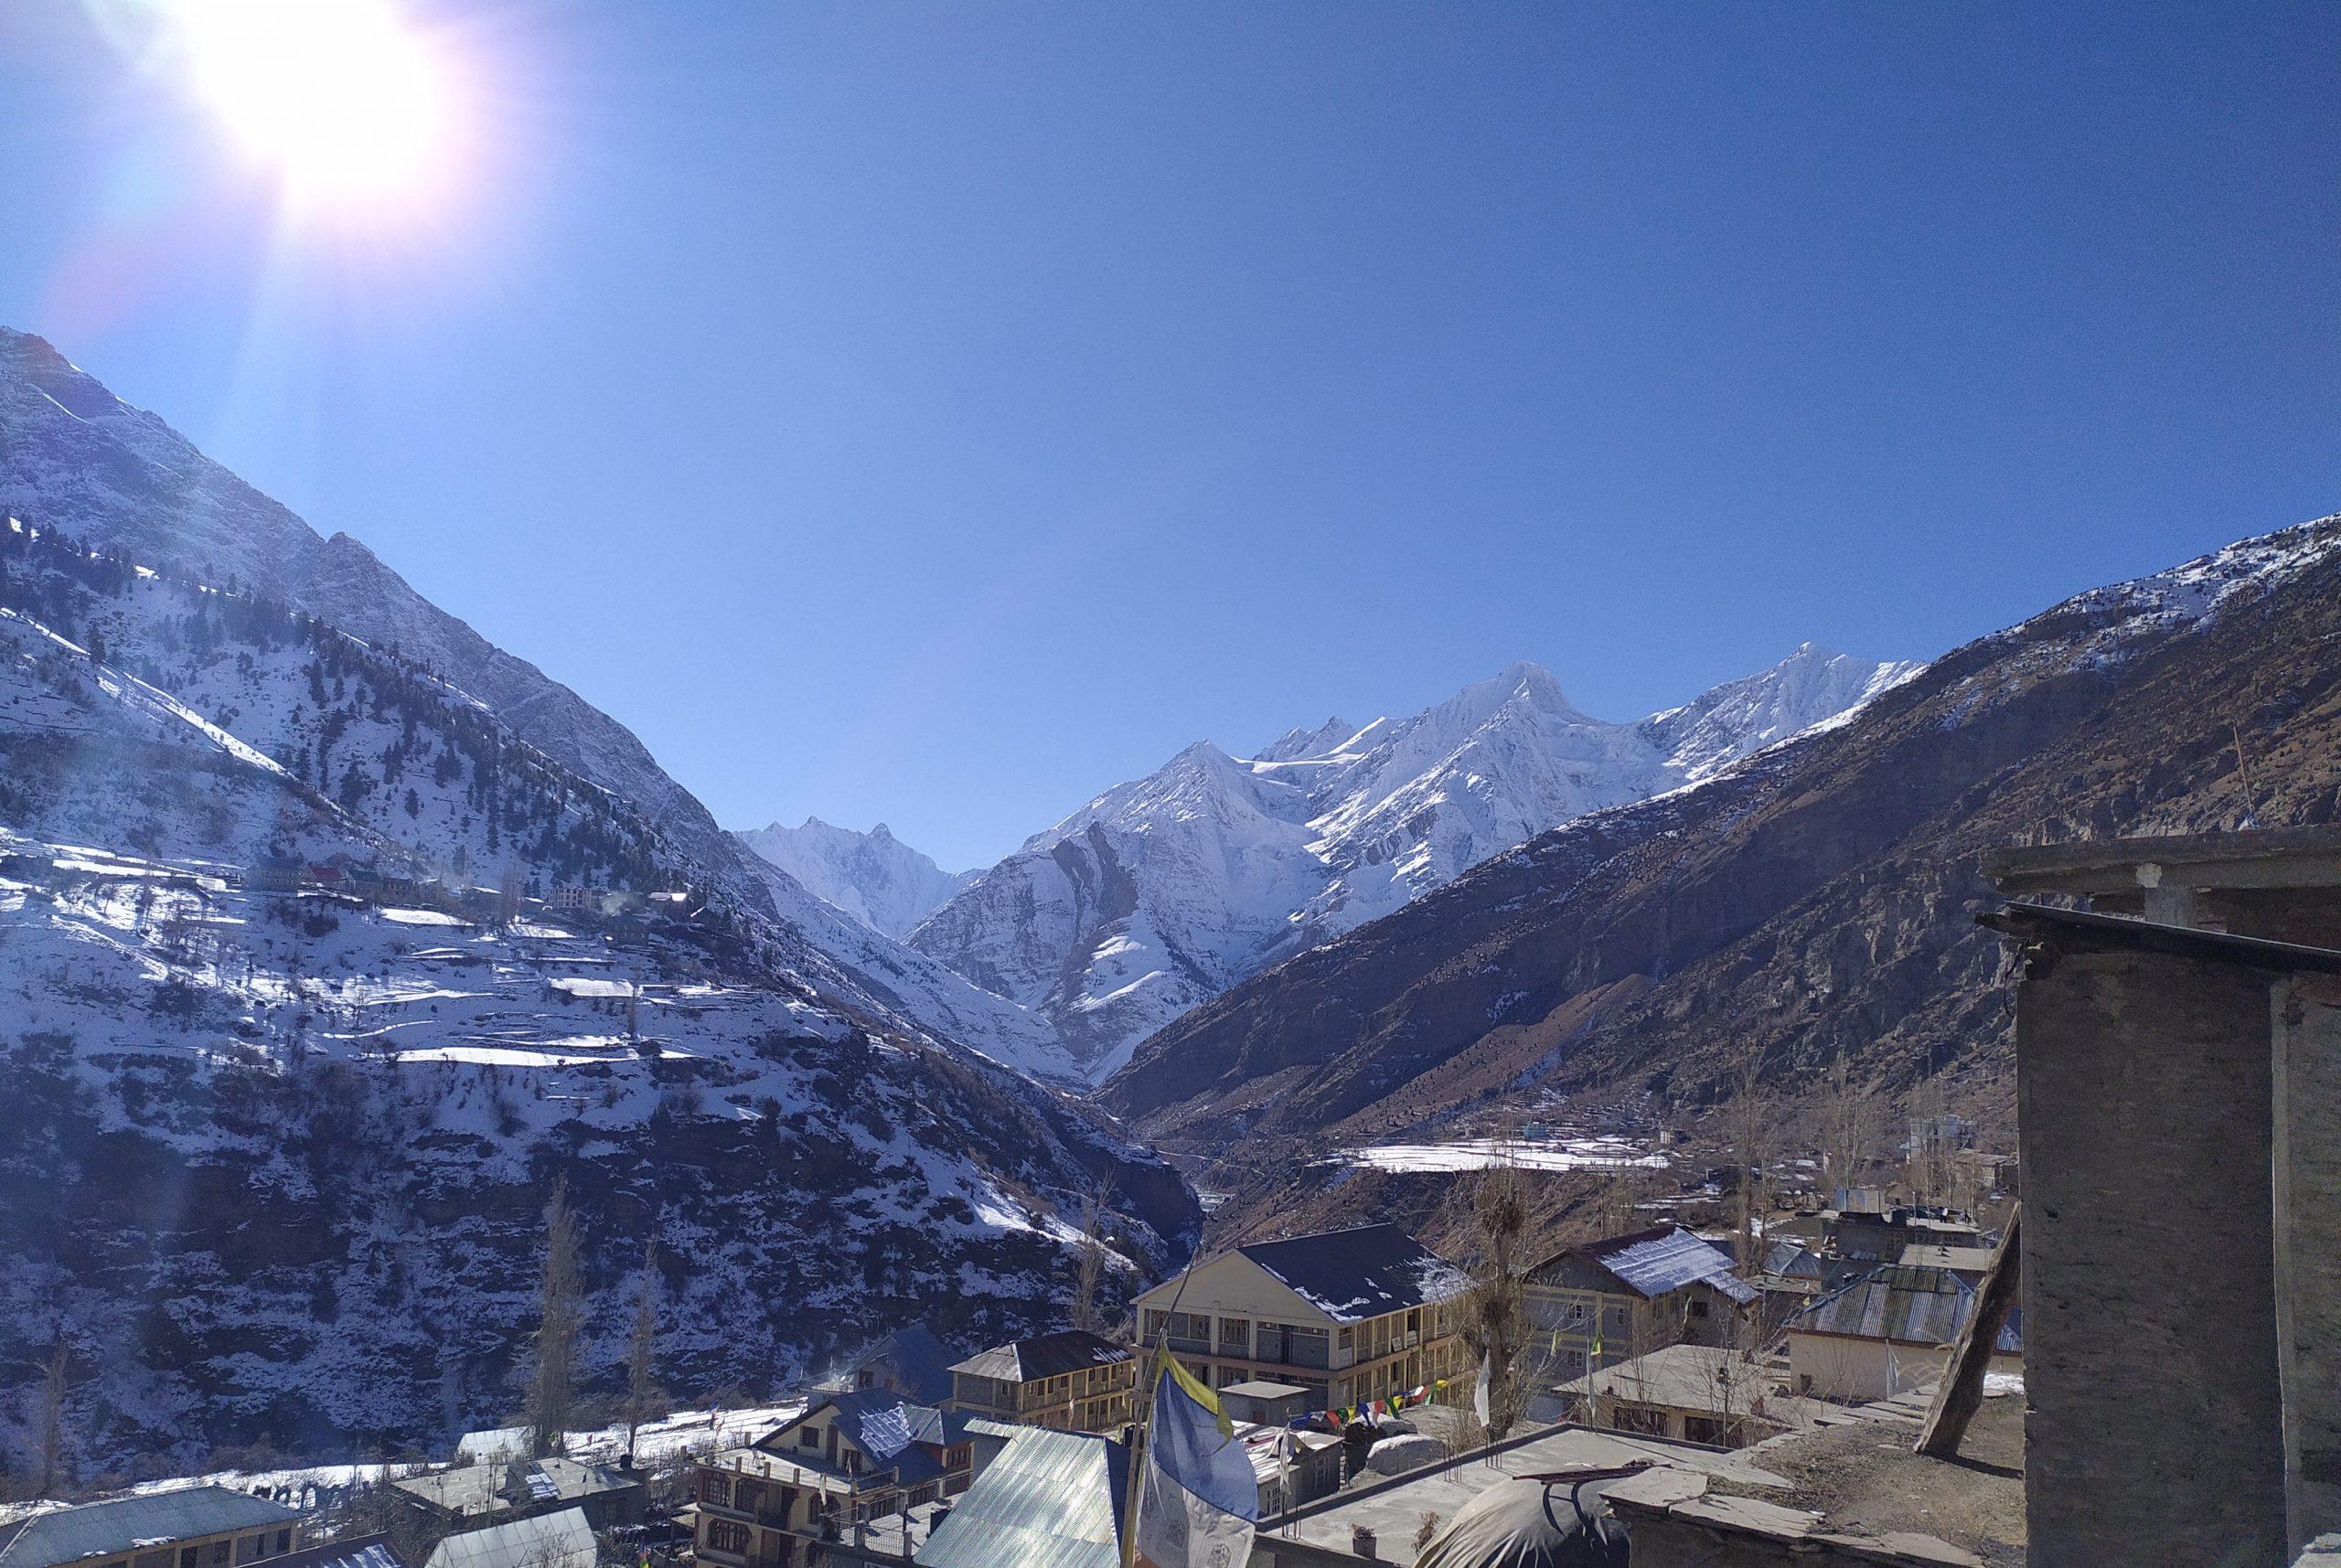 Lahaul Spiti Valley